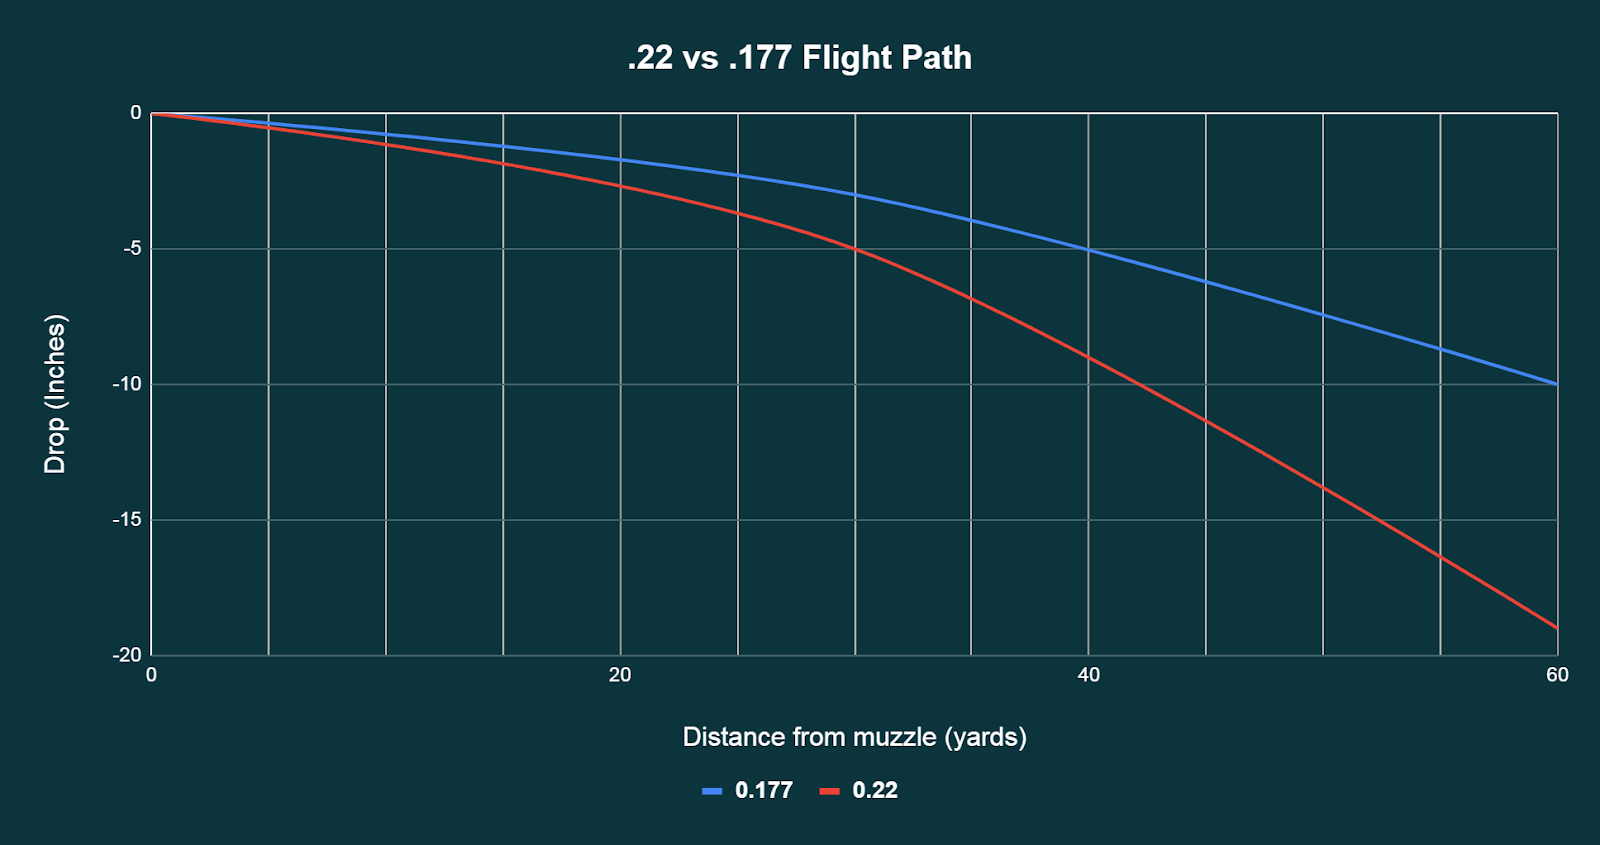 HUFQXp8XTazFEef9VGfRasUMfmUiCDQHVBJcA2wxoLbR9VyINwmoMUNCL41HguXByyipBYdug7QhIHb  tqzLAHqZKz3IBg 9zgeFr0WaExuaXlgHAm4 kC86wGkK2w4jglfRIvE Air rifle: The differences between .177 & .22 – and which jobs they do best